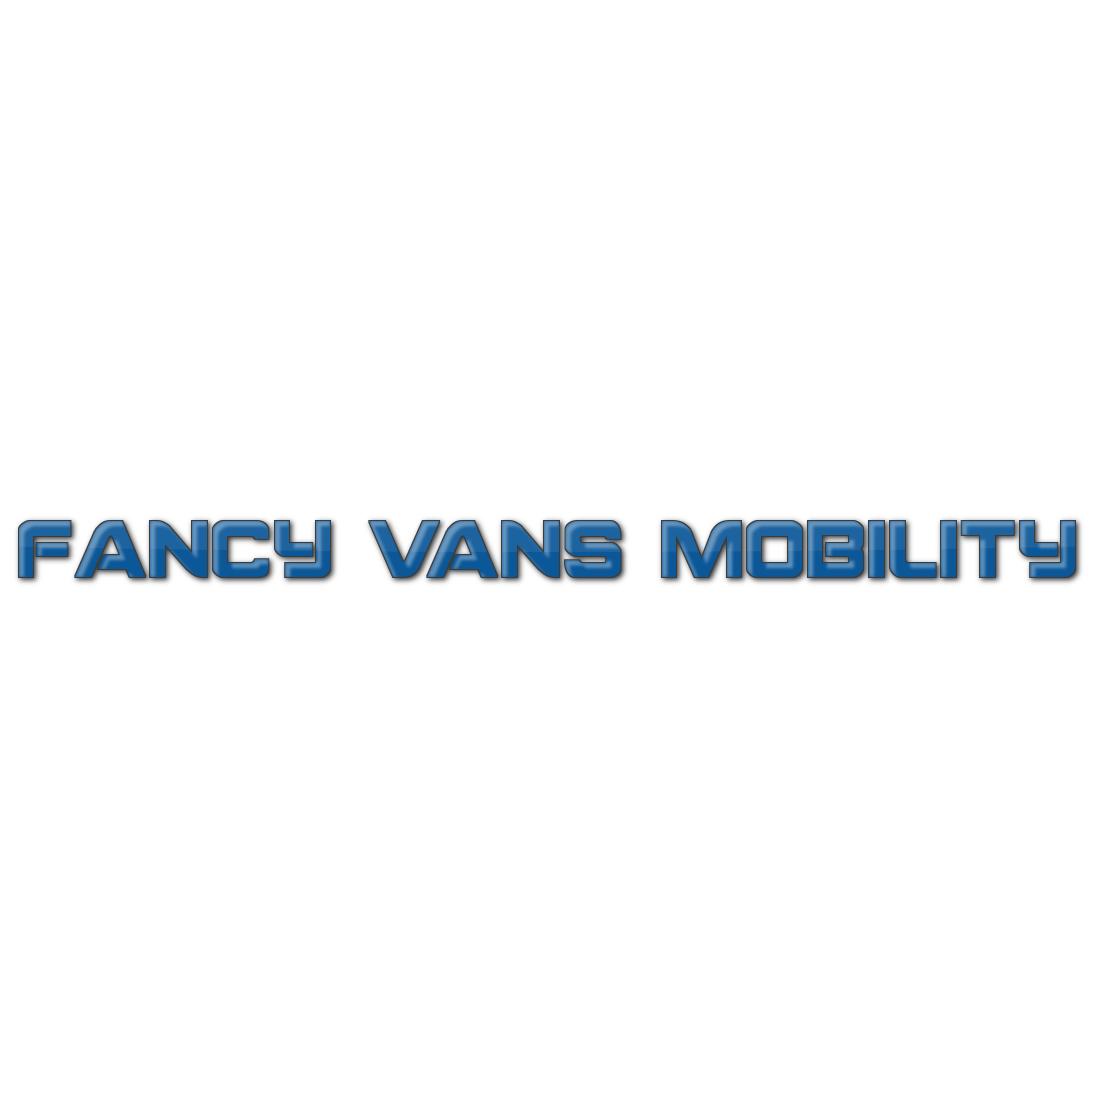 Fancy Vans Mobility